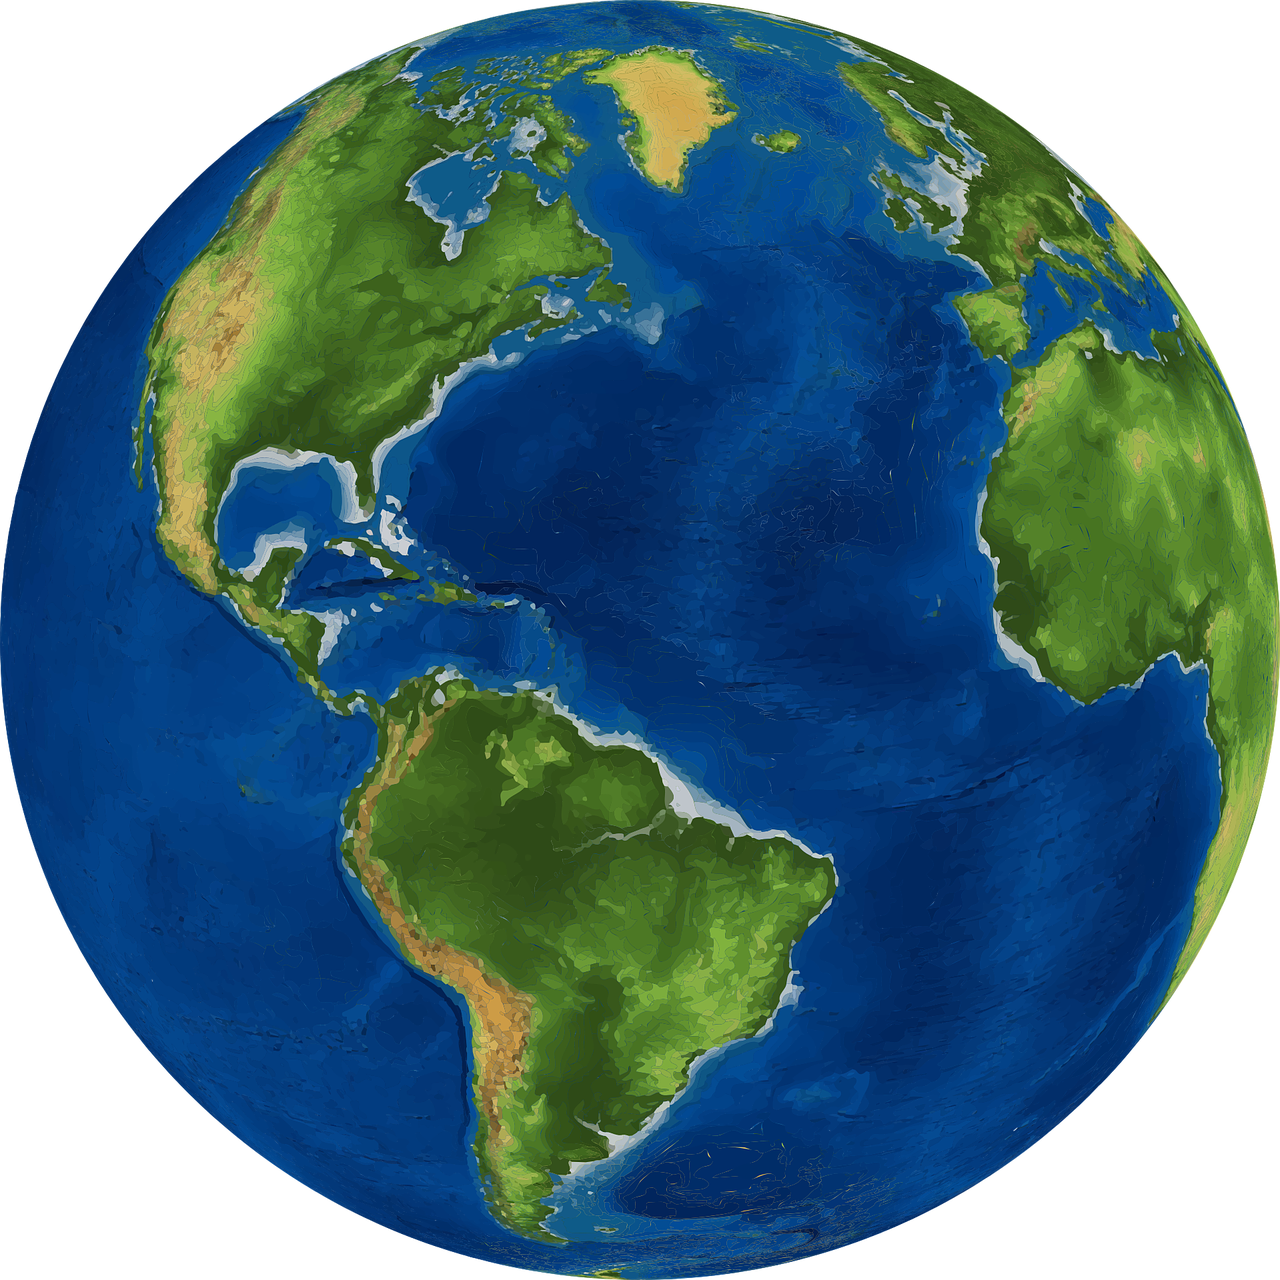 world-1301744_1280